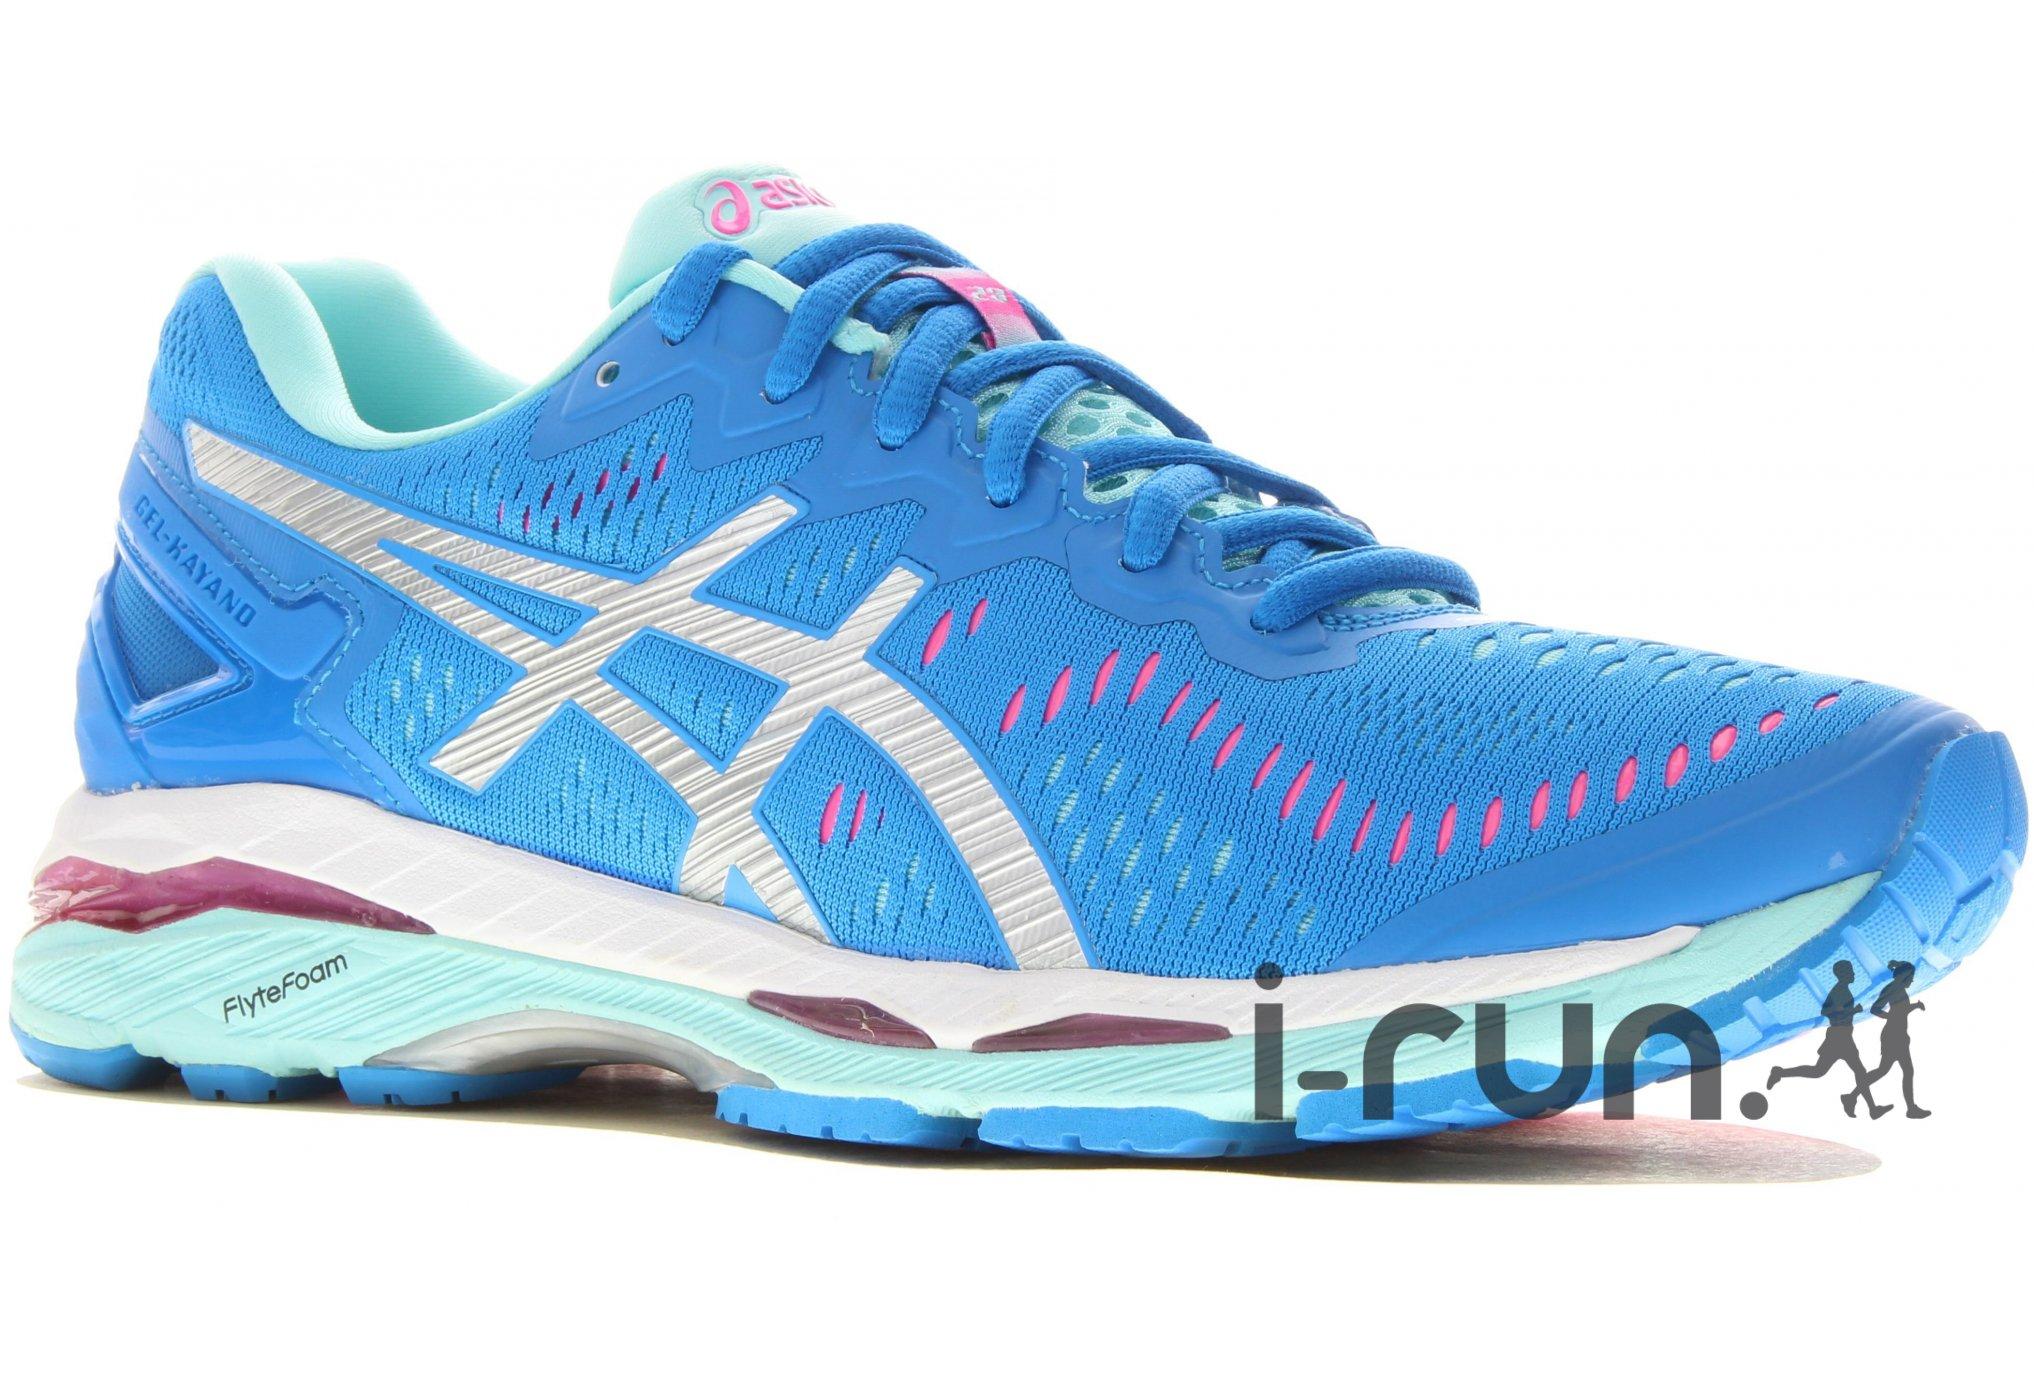 La Fortifiée Asics Gel Kayano 23 W Chaussures running femme